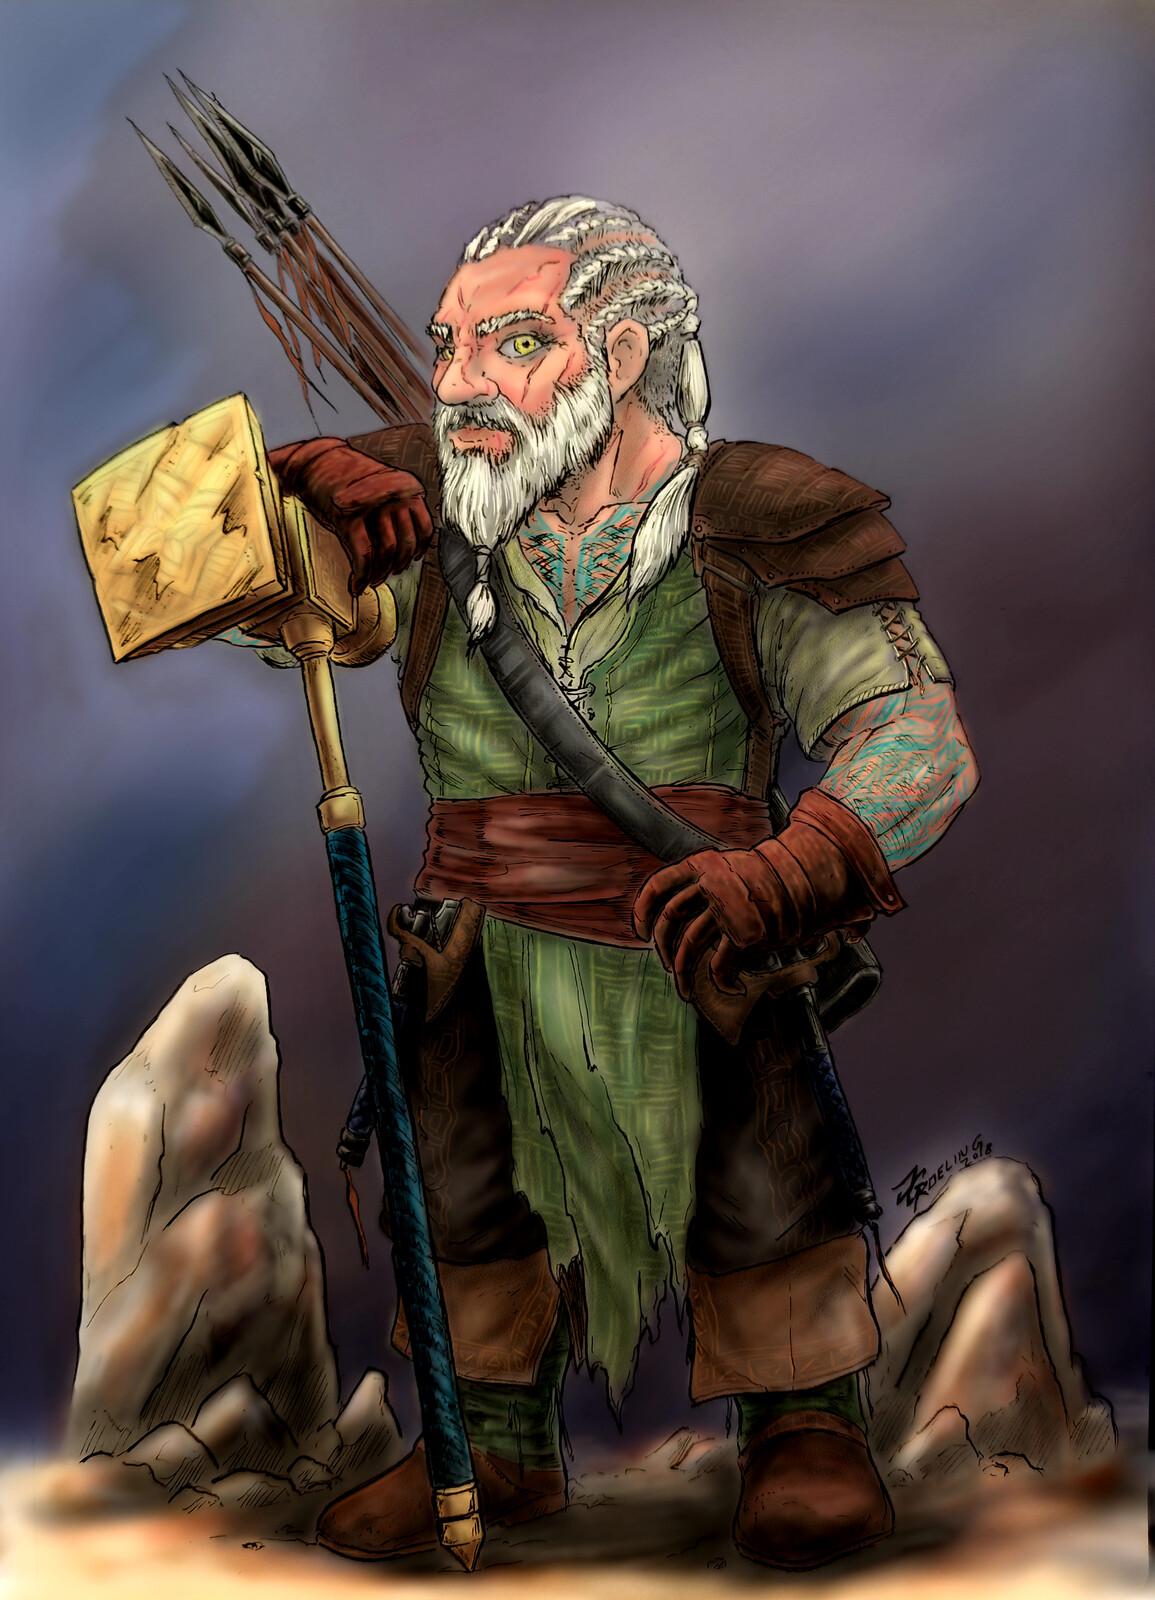 Dwarven Barbarian - D&D commission